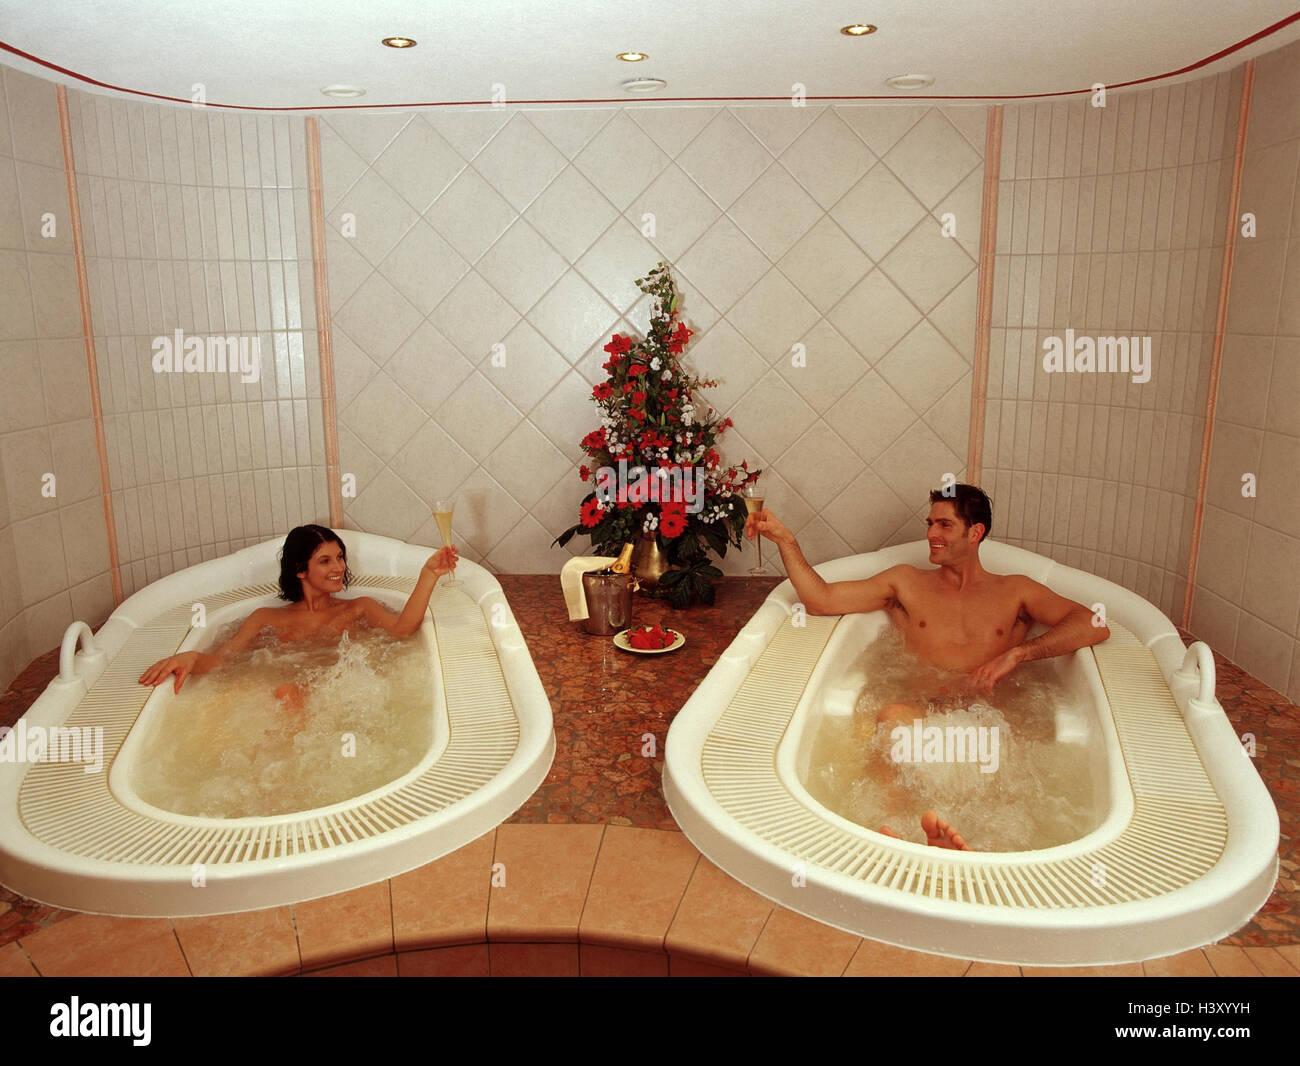 Vasche Da Bagno Jacuzzi Confronta Prezzi : Vasche da bagno jacuzzi great vasche da bagno economiche prezzi